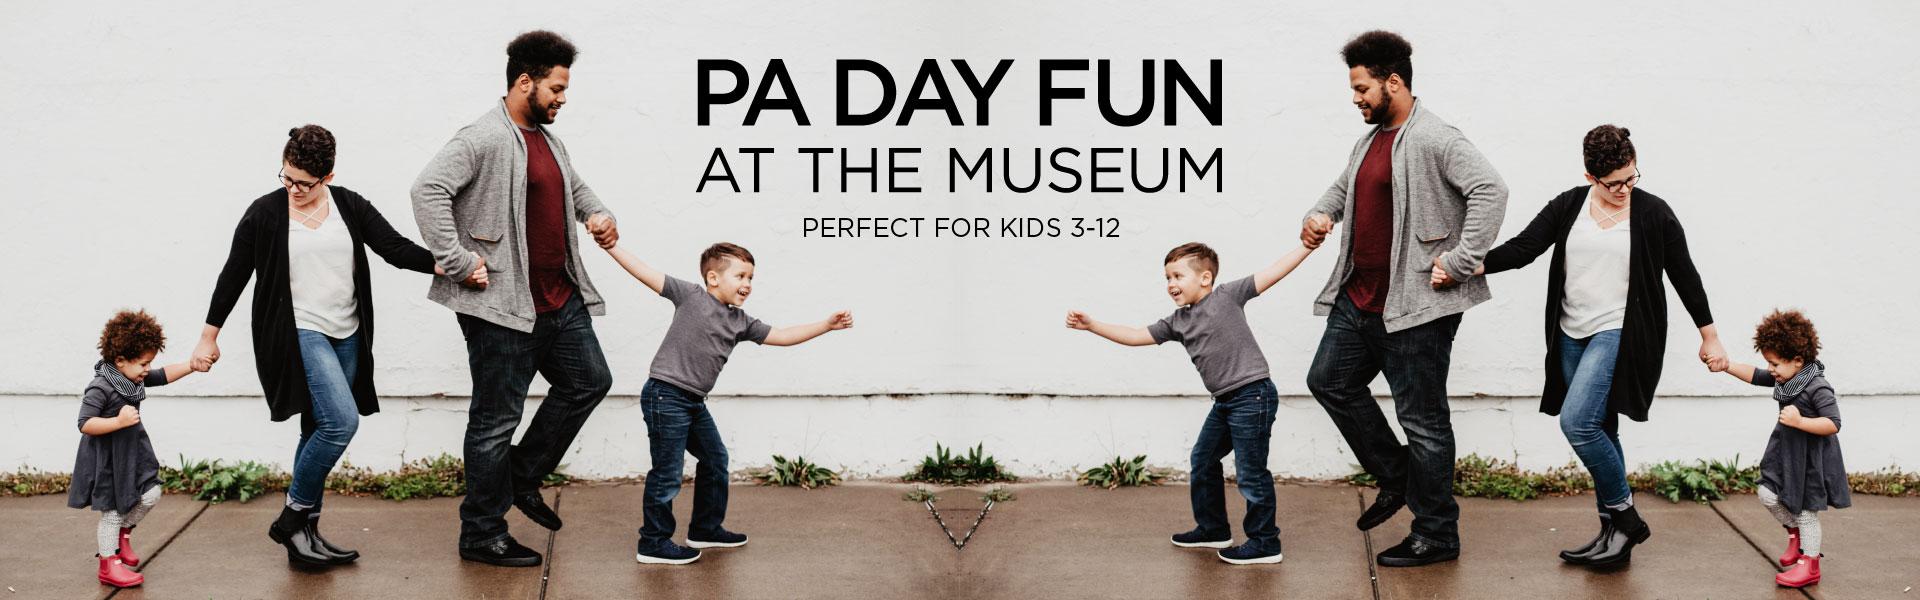 P.A. Day Fun